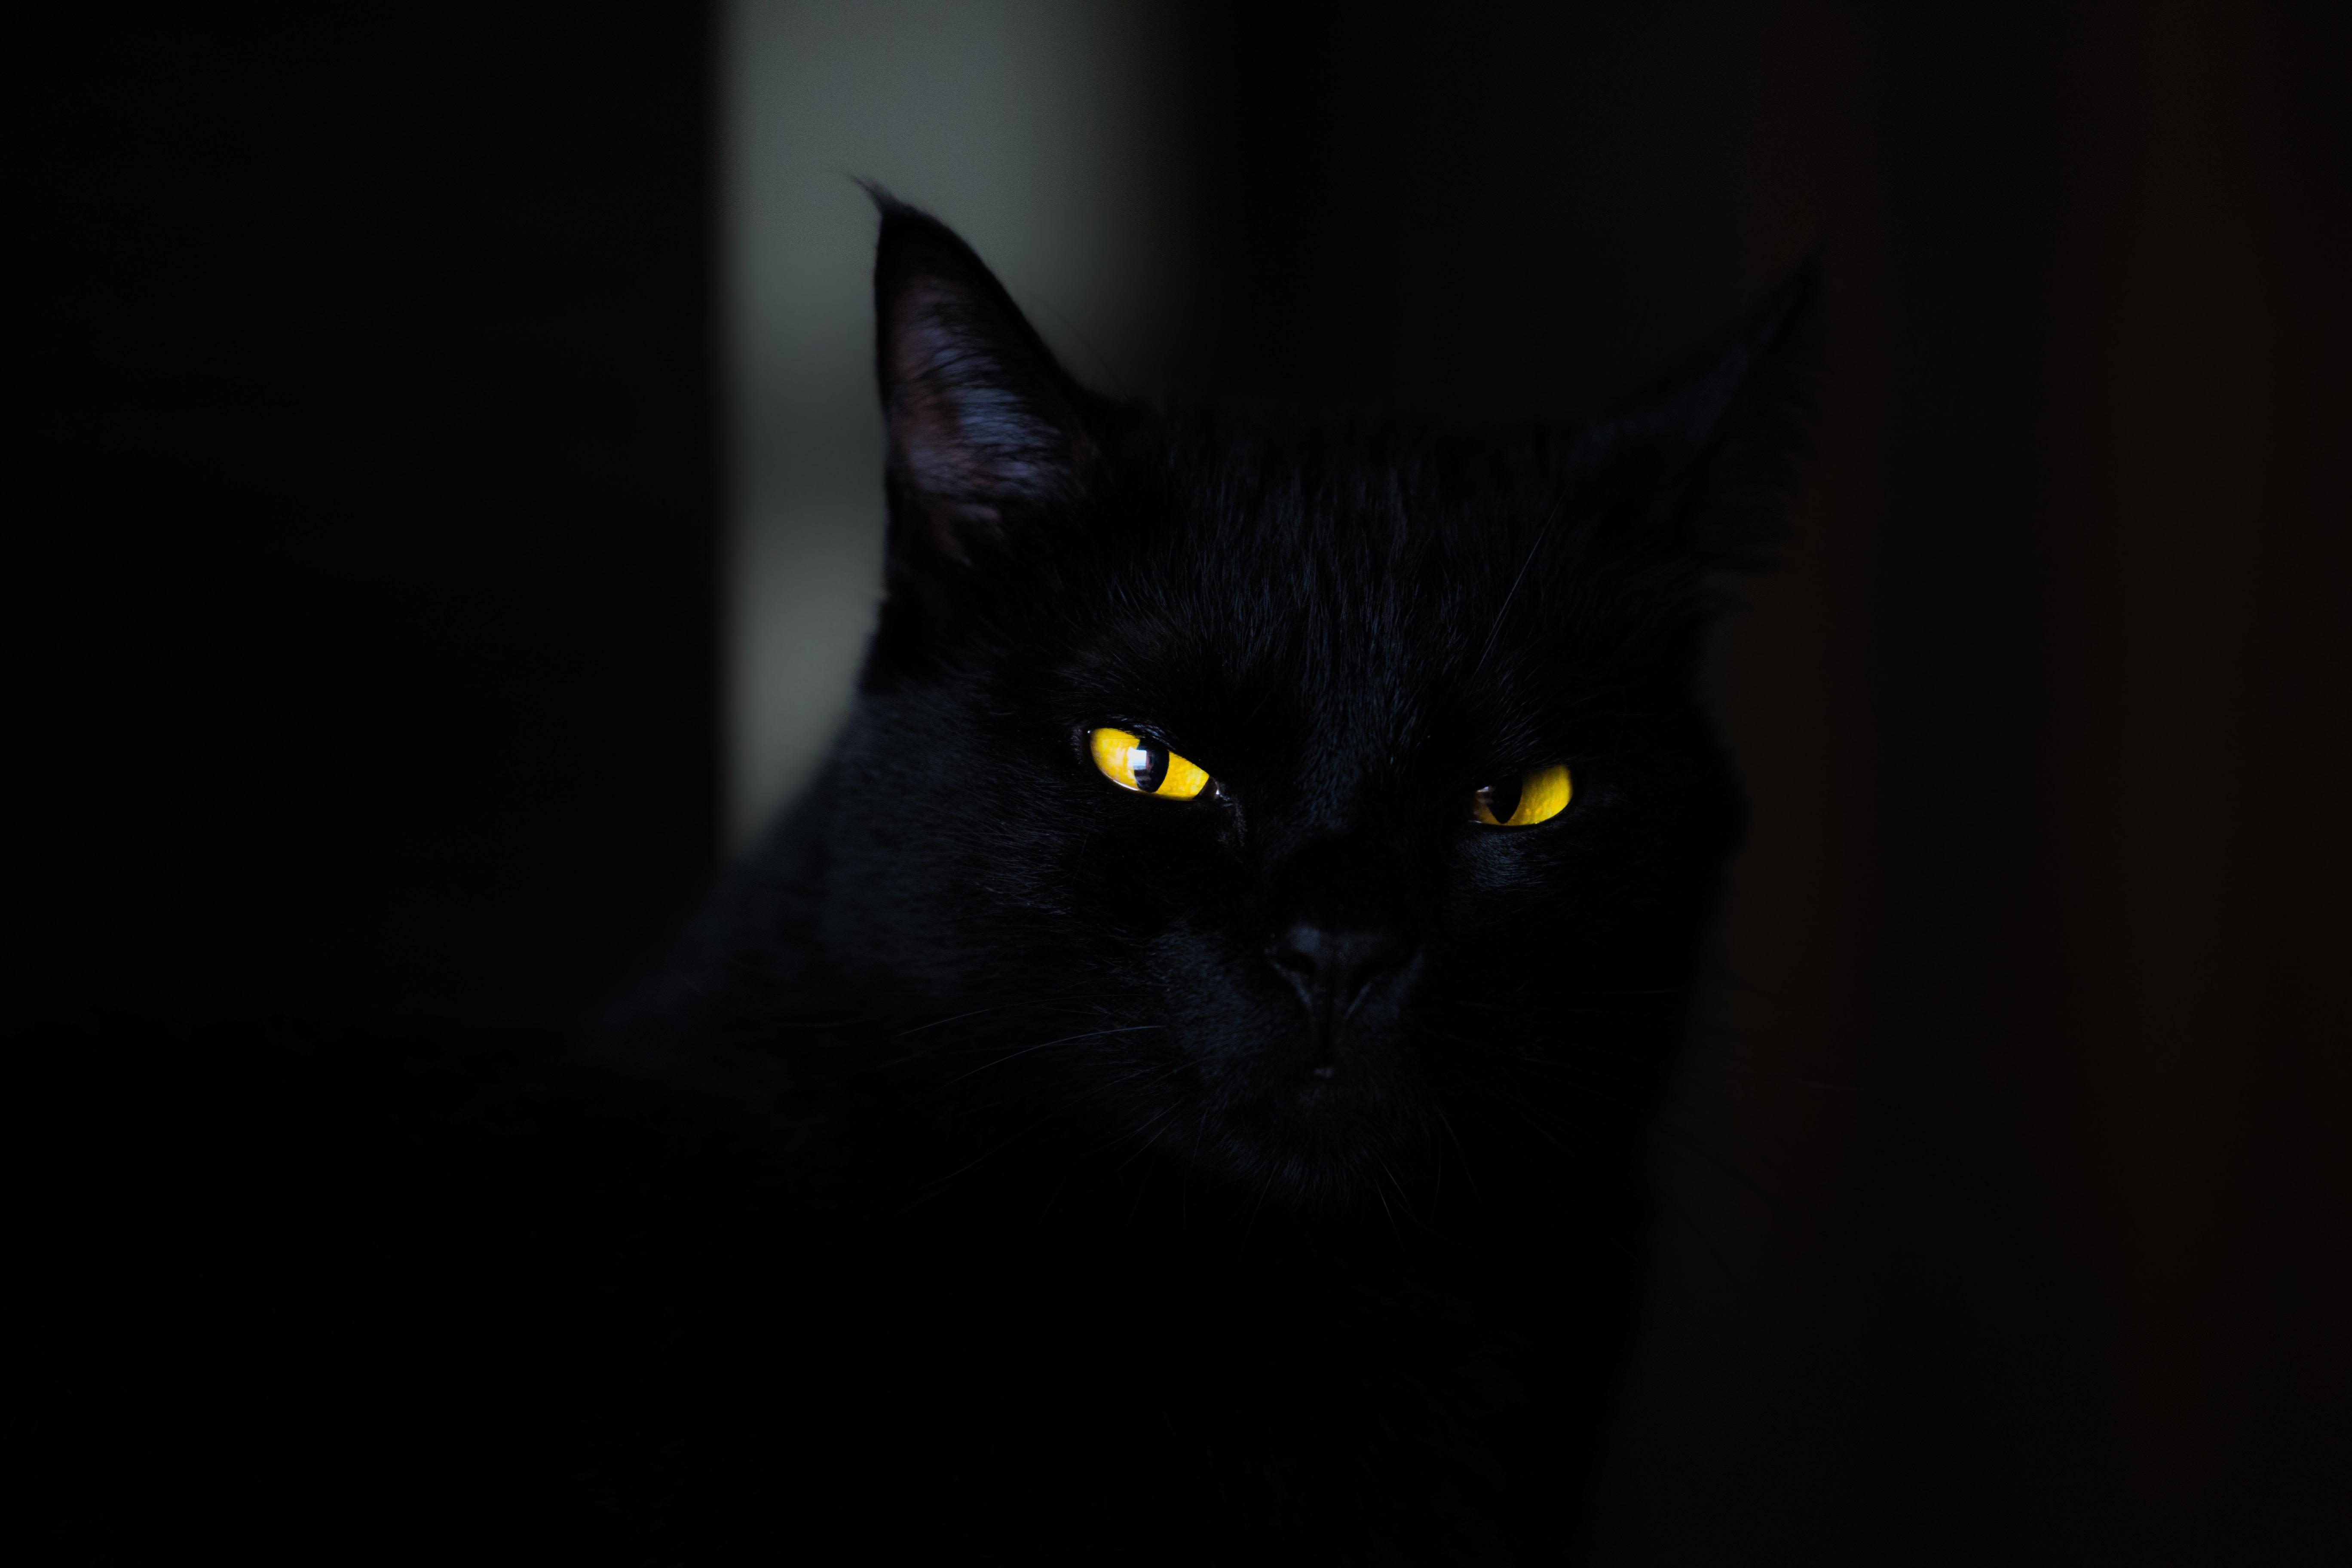 closeup photo of black cat